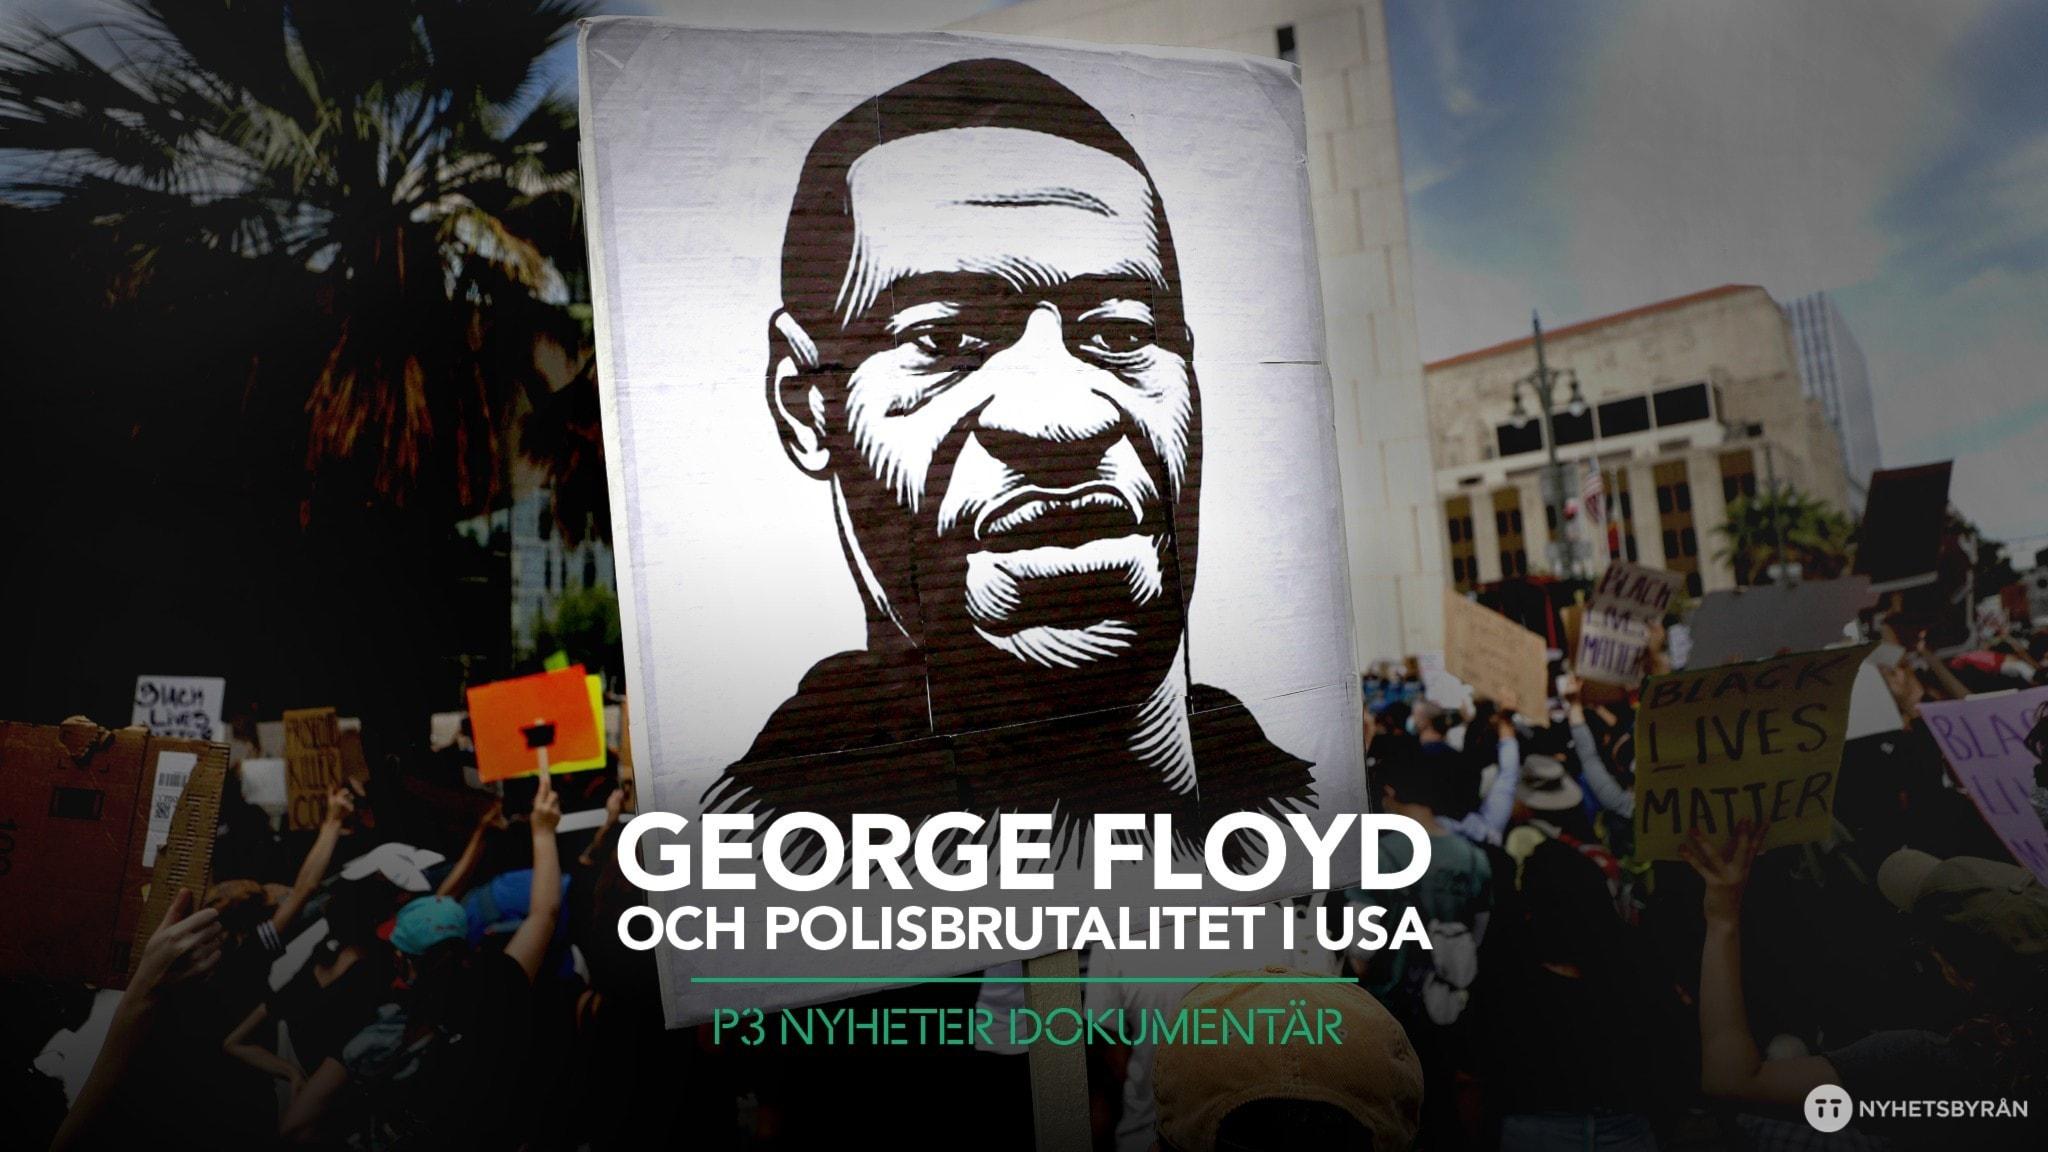 George Floyd och polisbrutalitet i USA